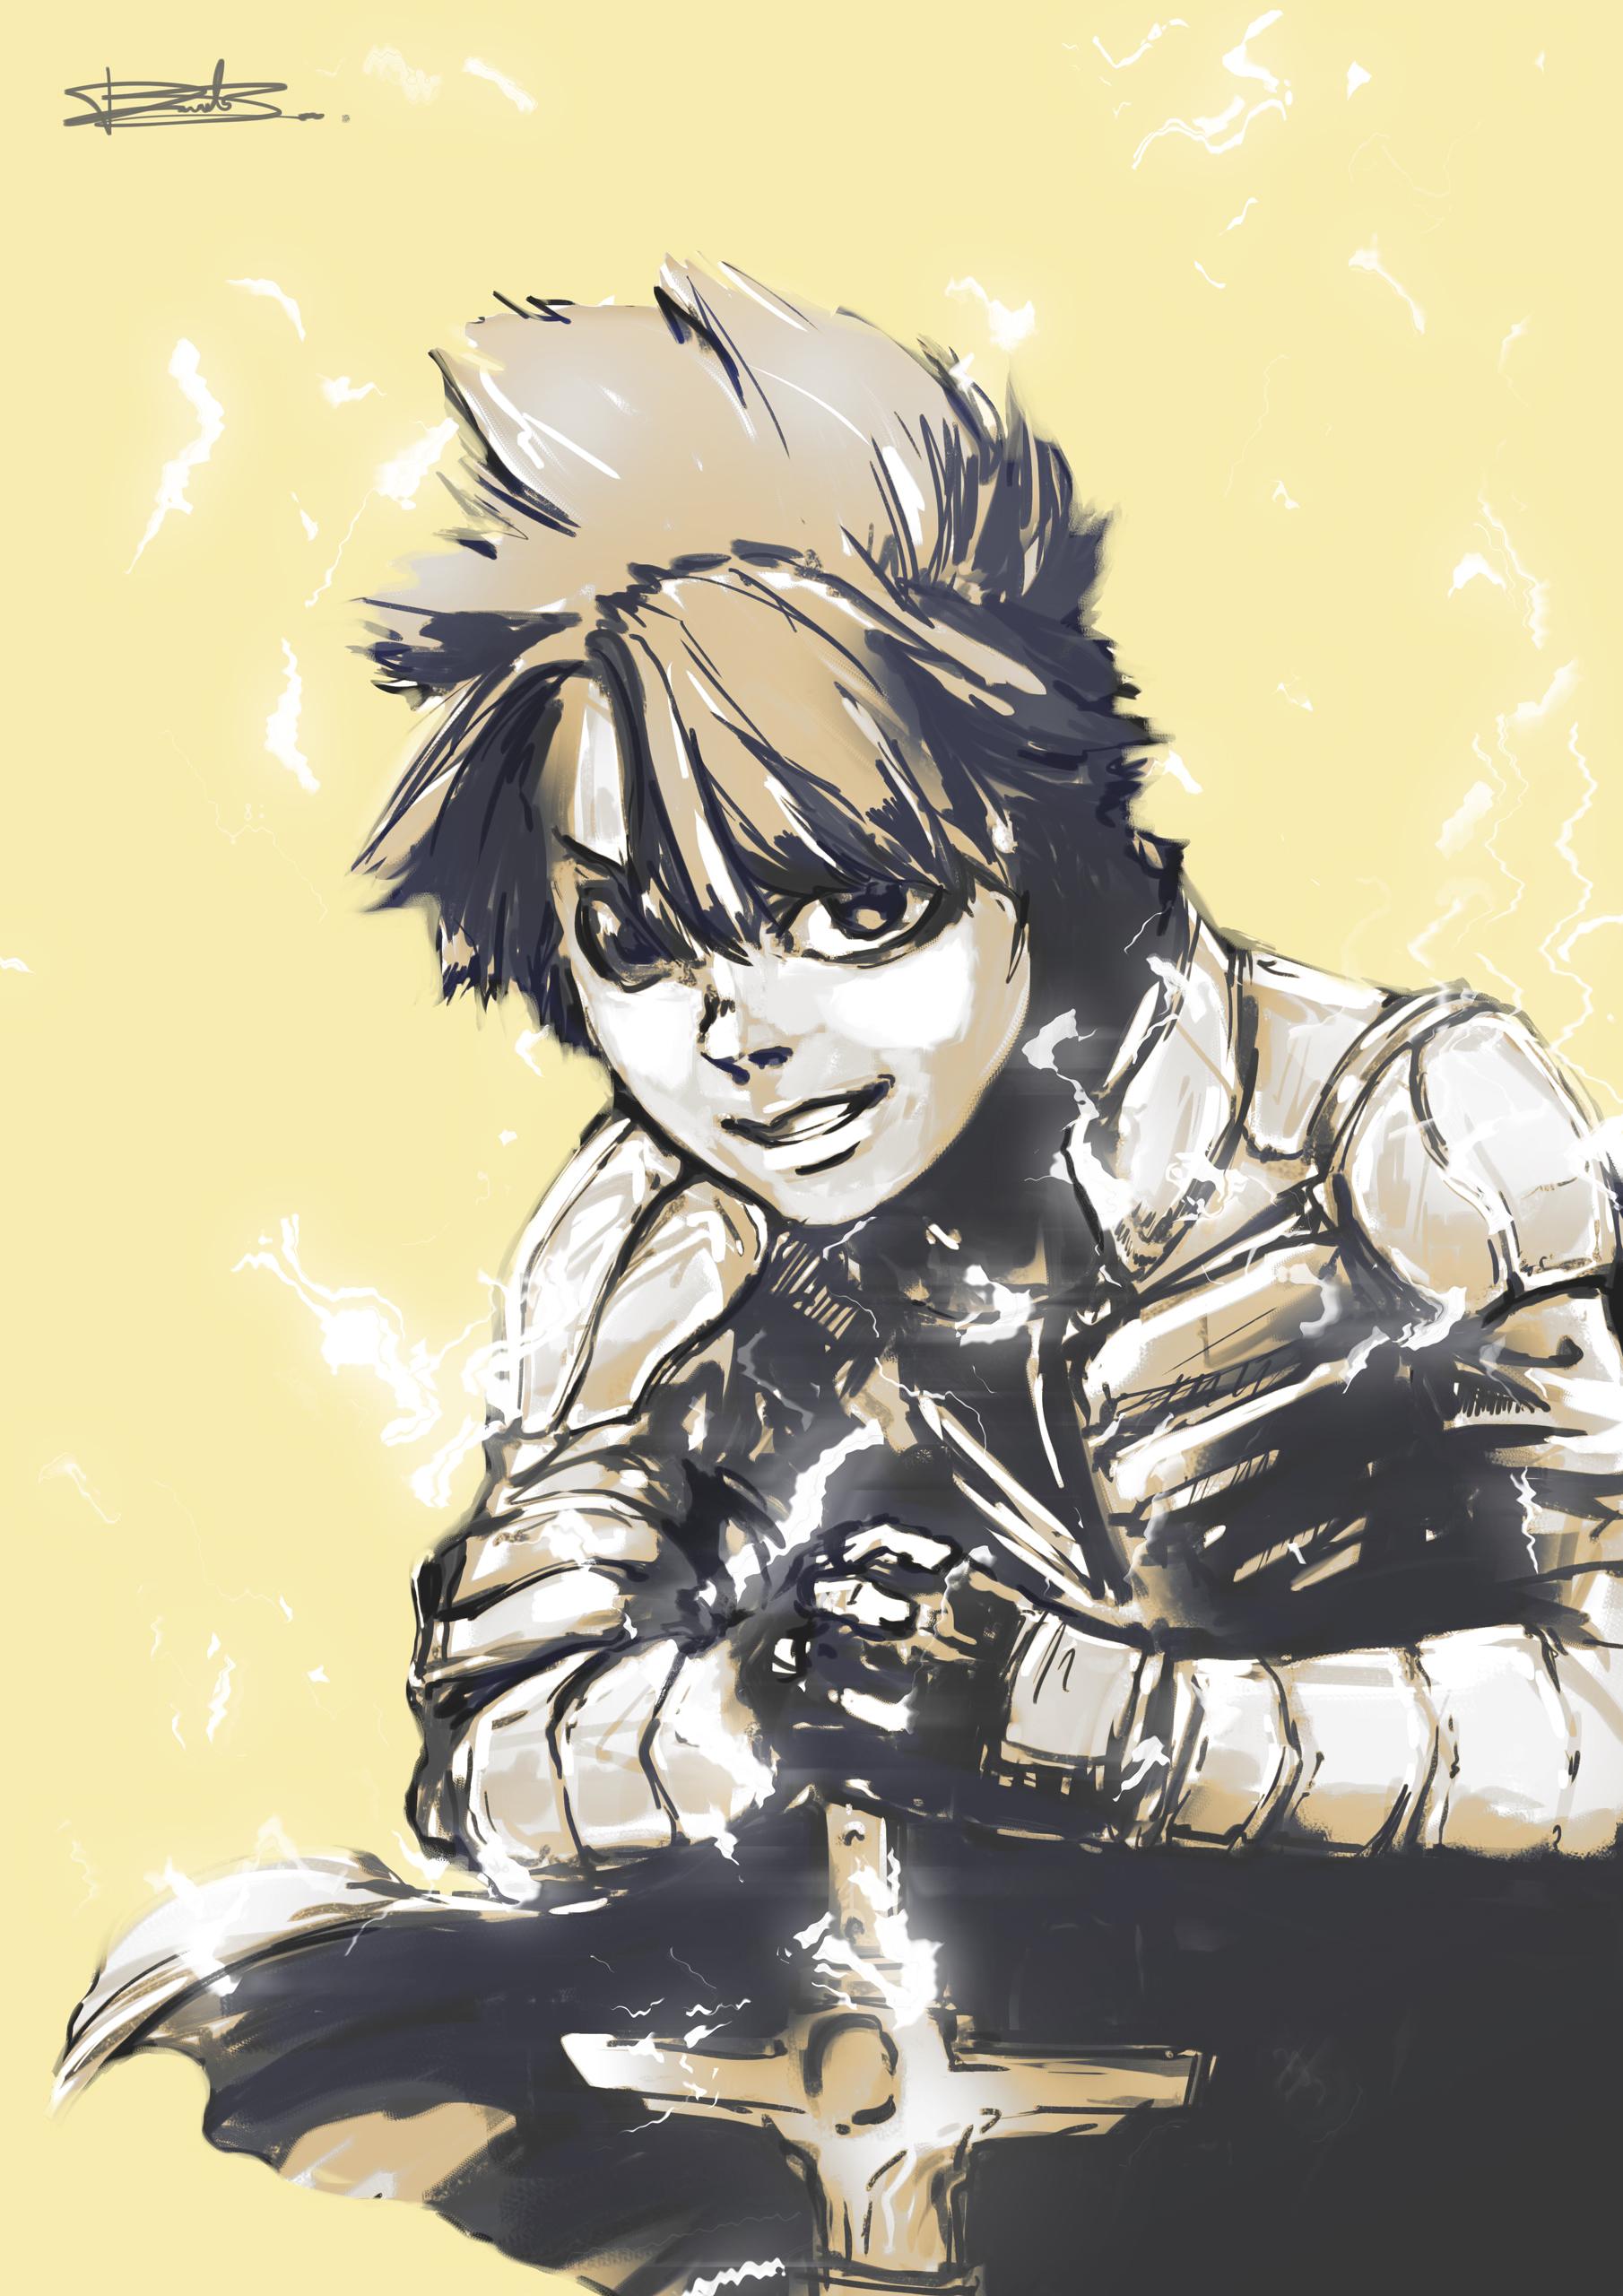 AwW Character Art - Leo